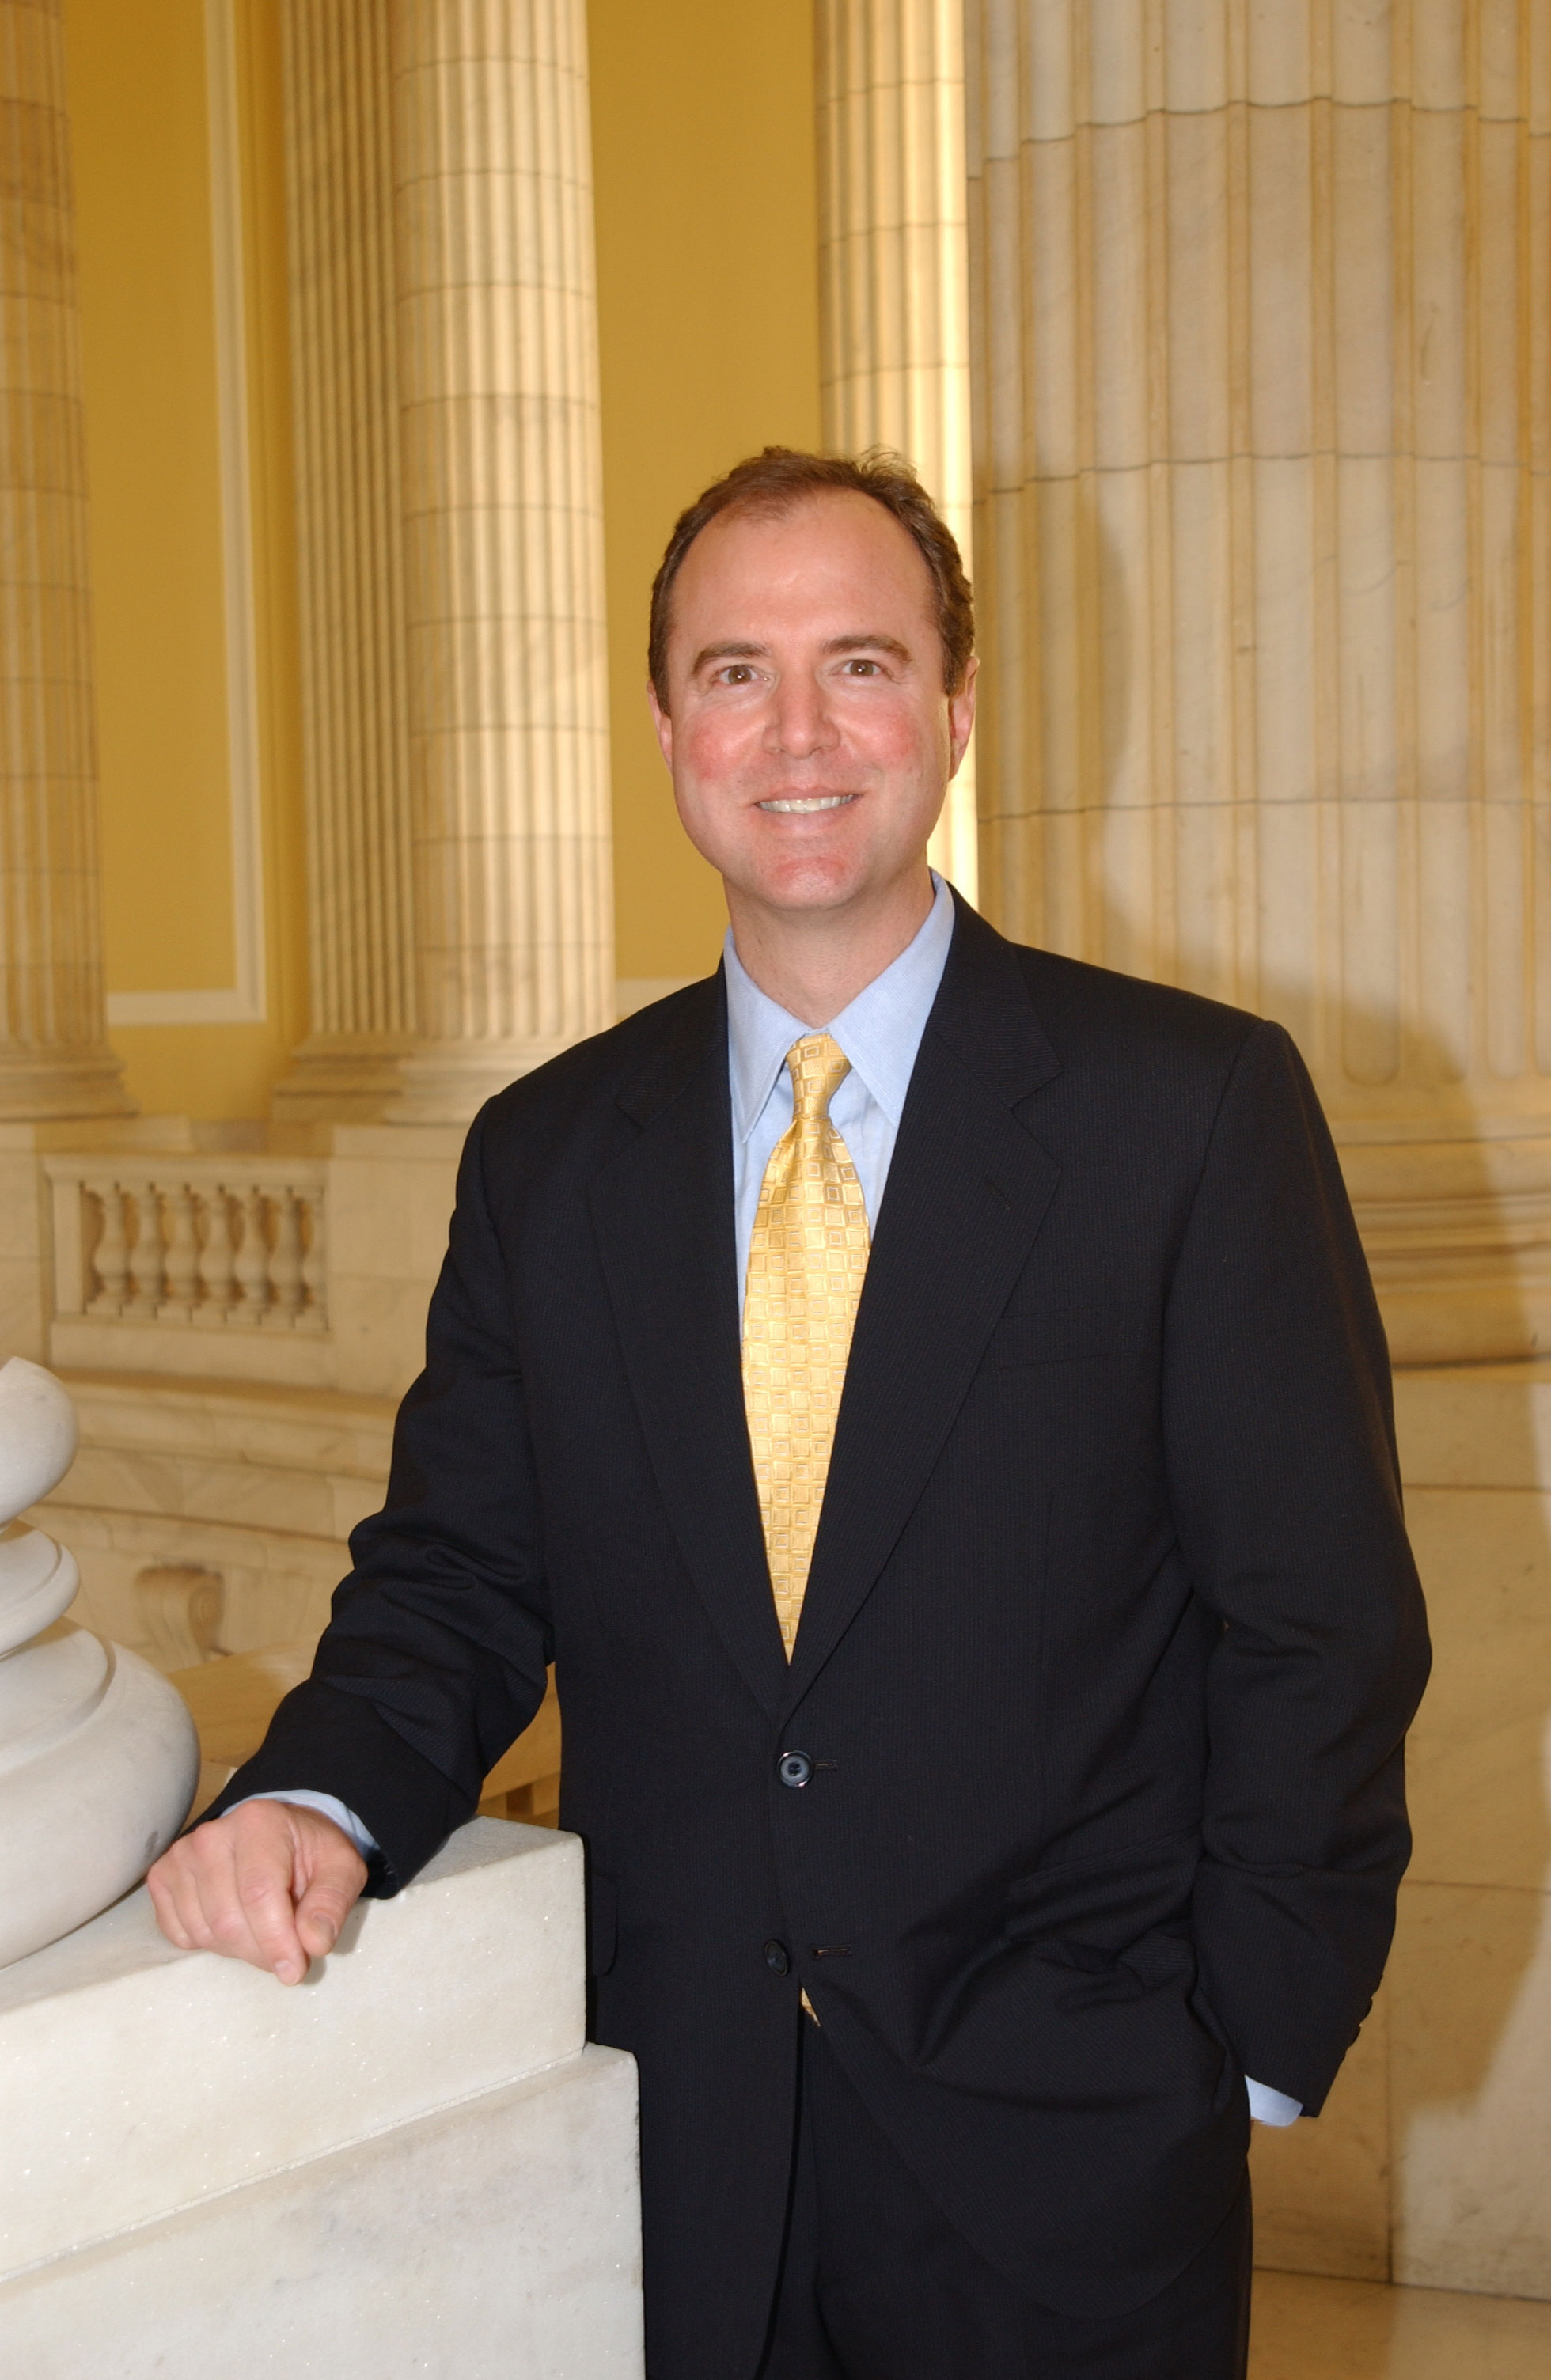 Congressman Adam Schiff  U.S. House of Representatives, CA-28